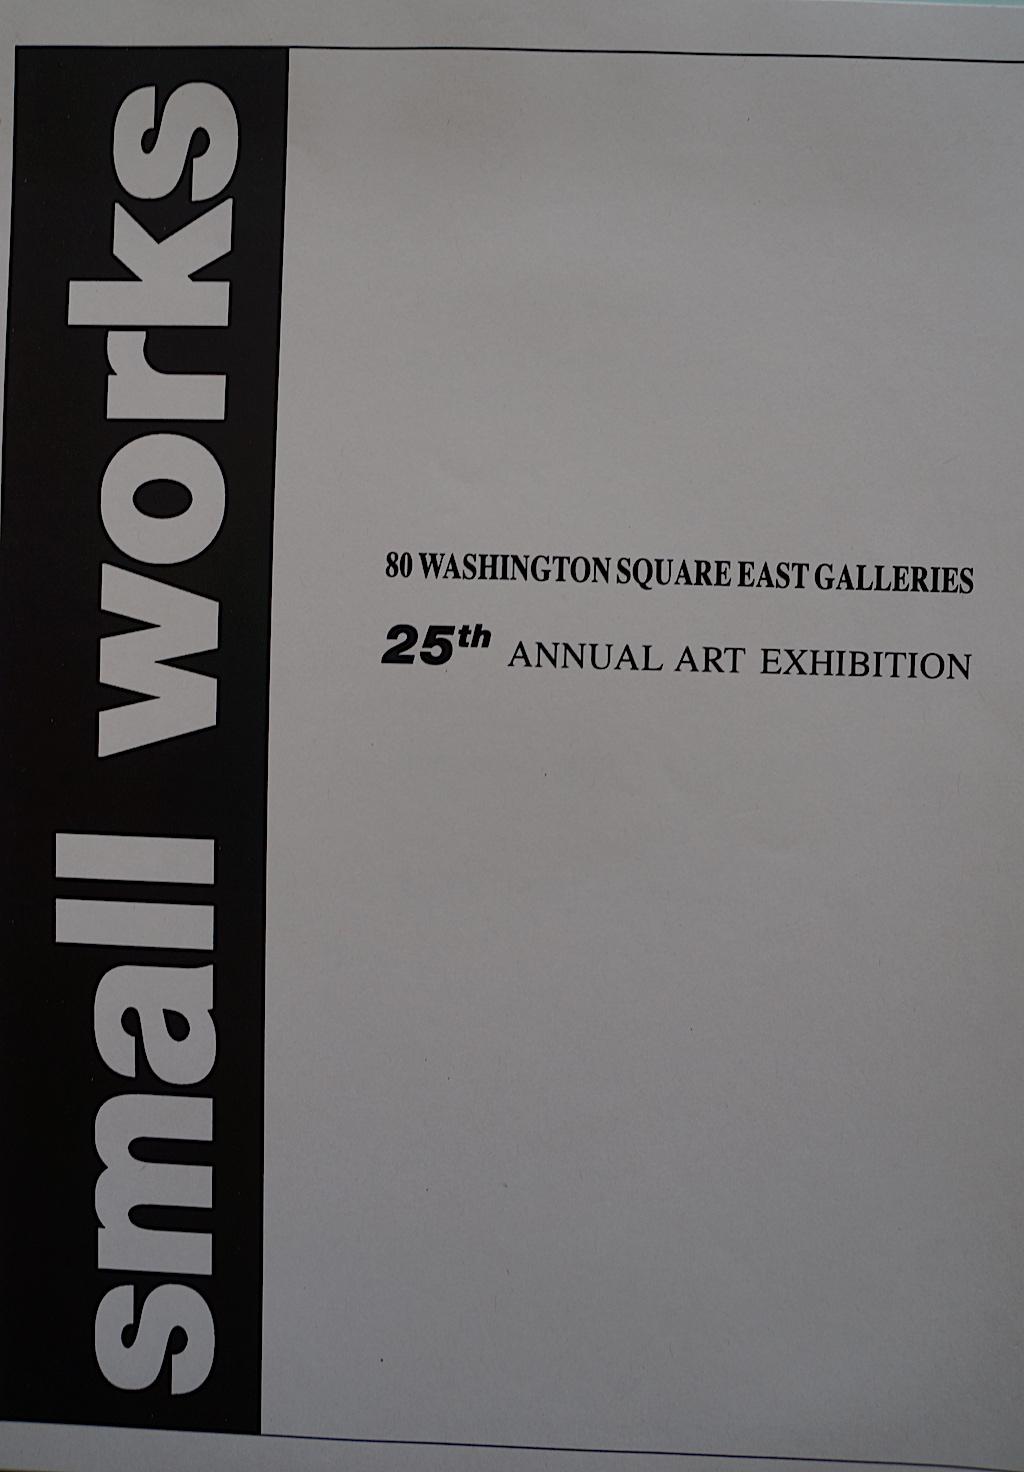 Washington SE Galleries 25th